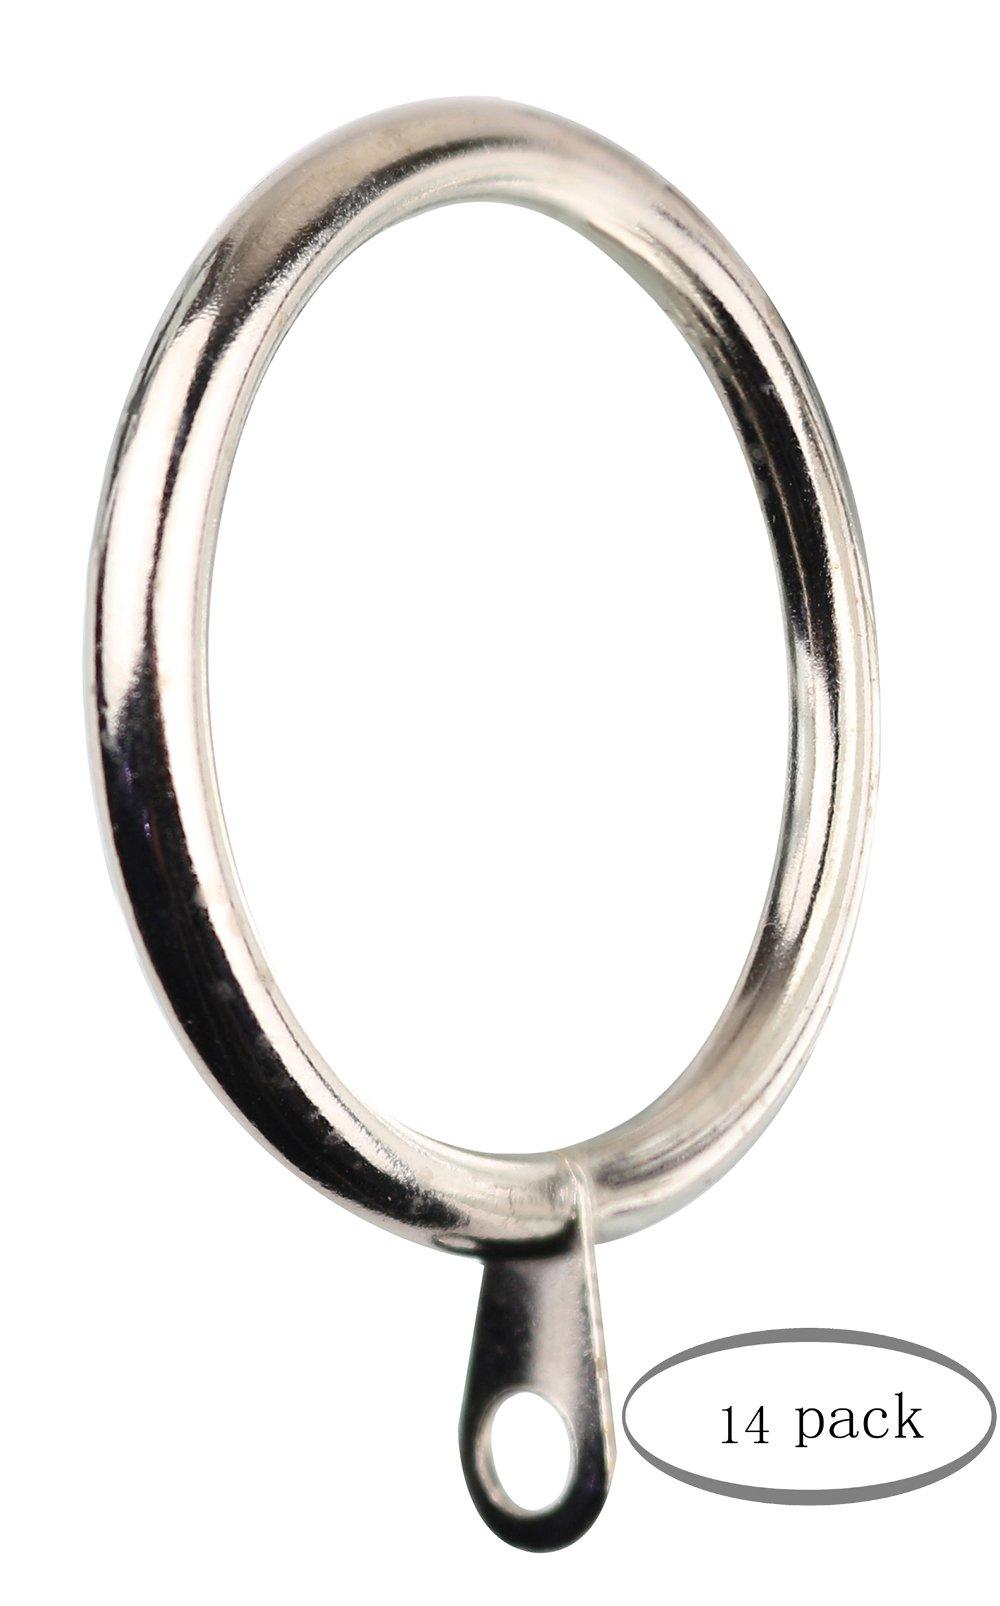 Meriville 14 pcs Satin Nickel 2-Inch Inner Diameter Metal Curtain Rings with Eyelets